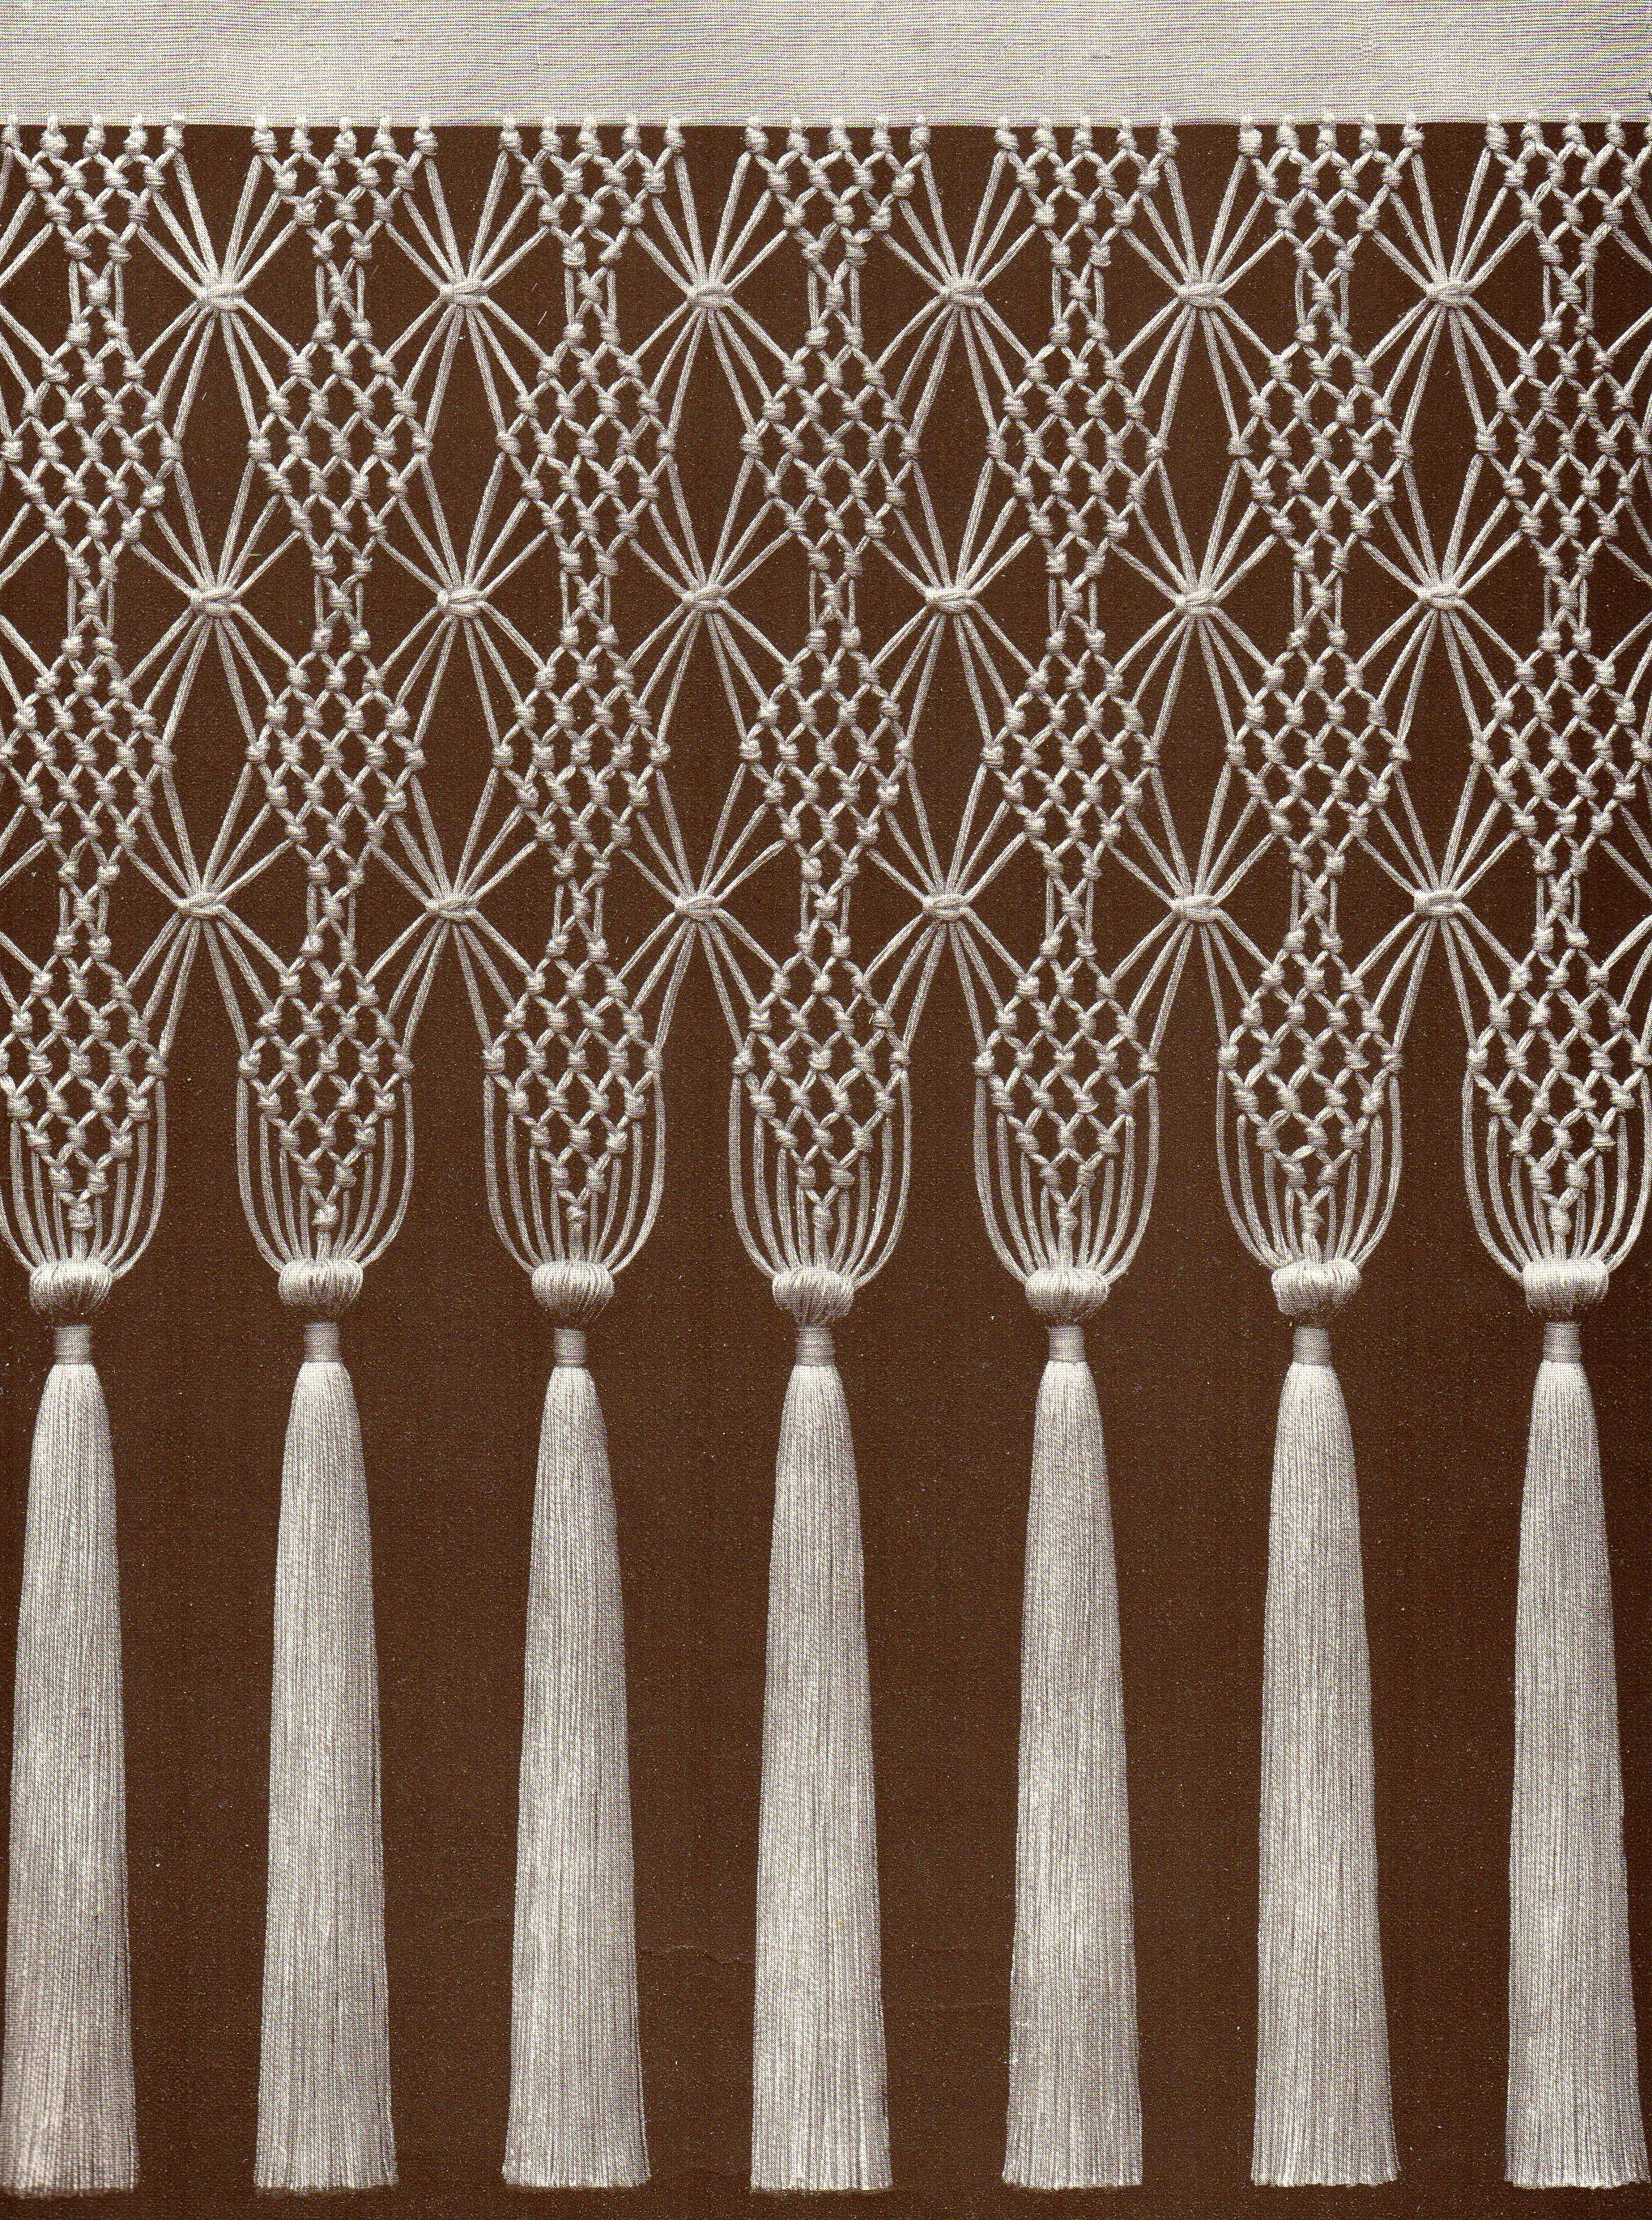 1000 Ideas About Macrame Curtain On Pinterest Macrame